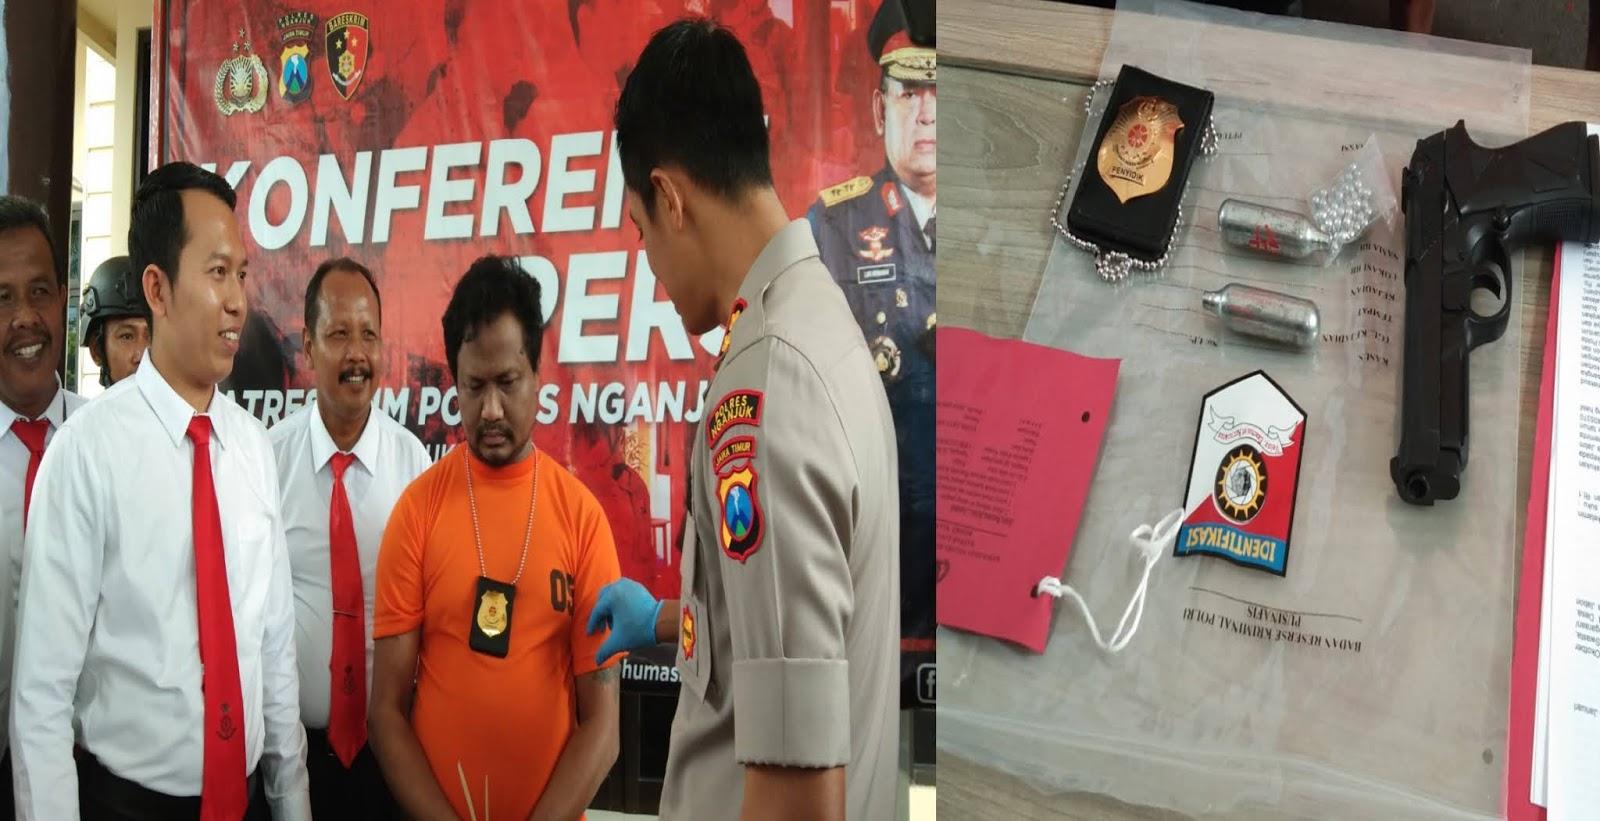 POLISI GADUNGAN PANGKAT IPDA TIPU WANITA 45 TAHUN